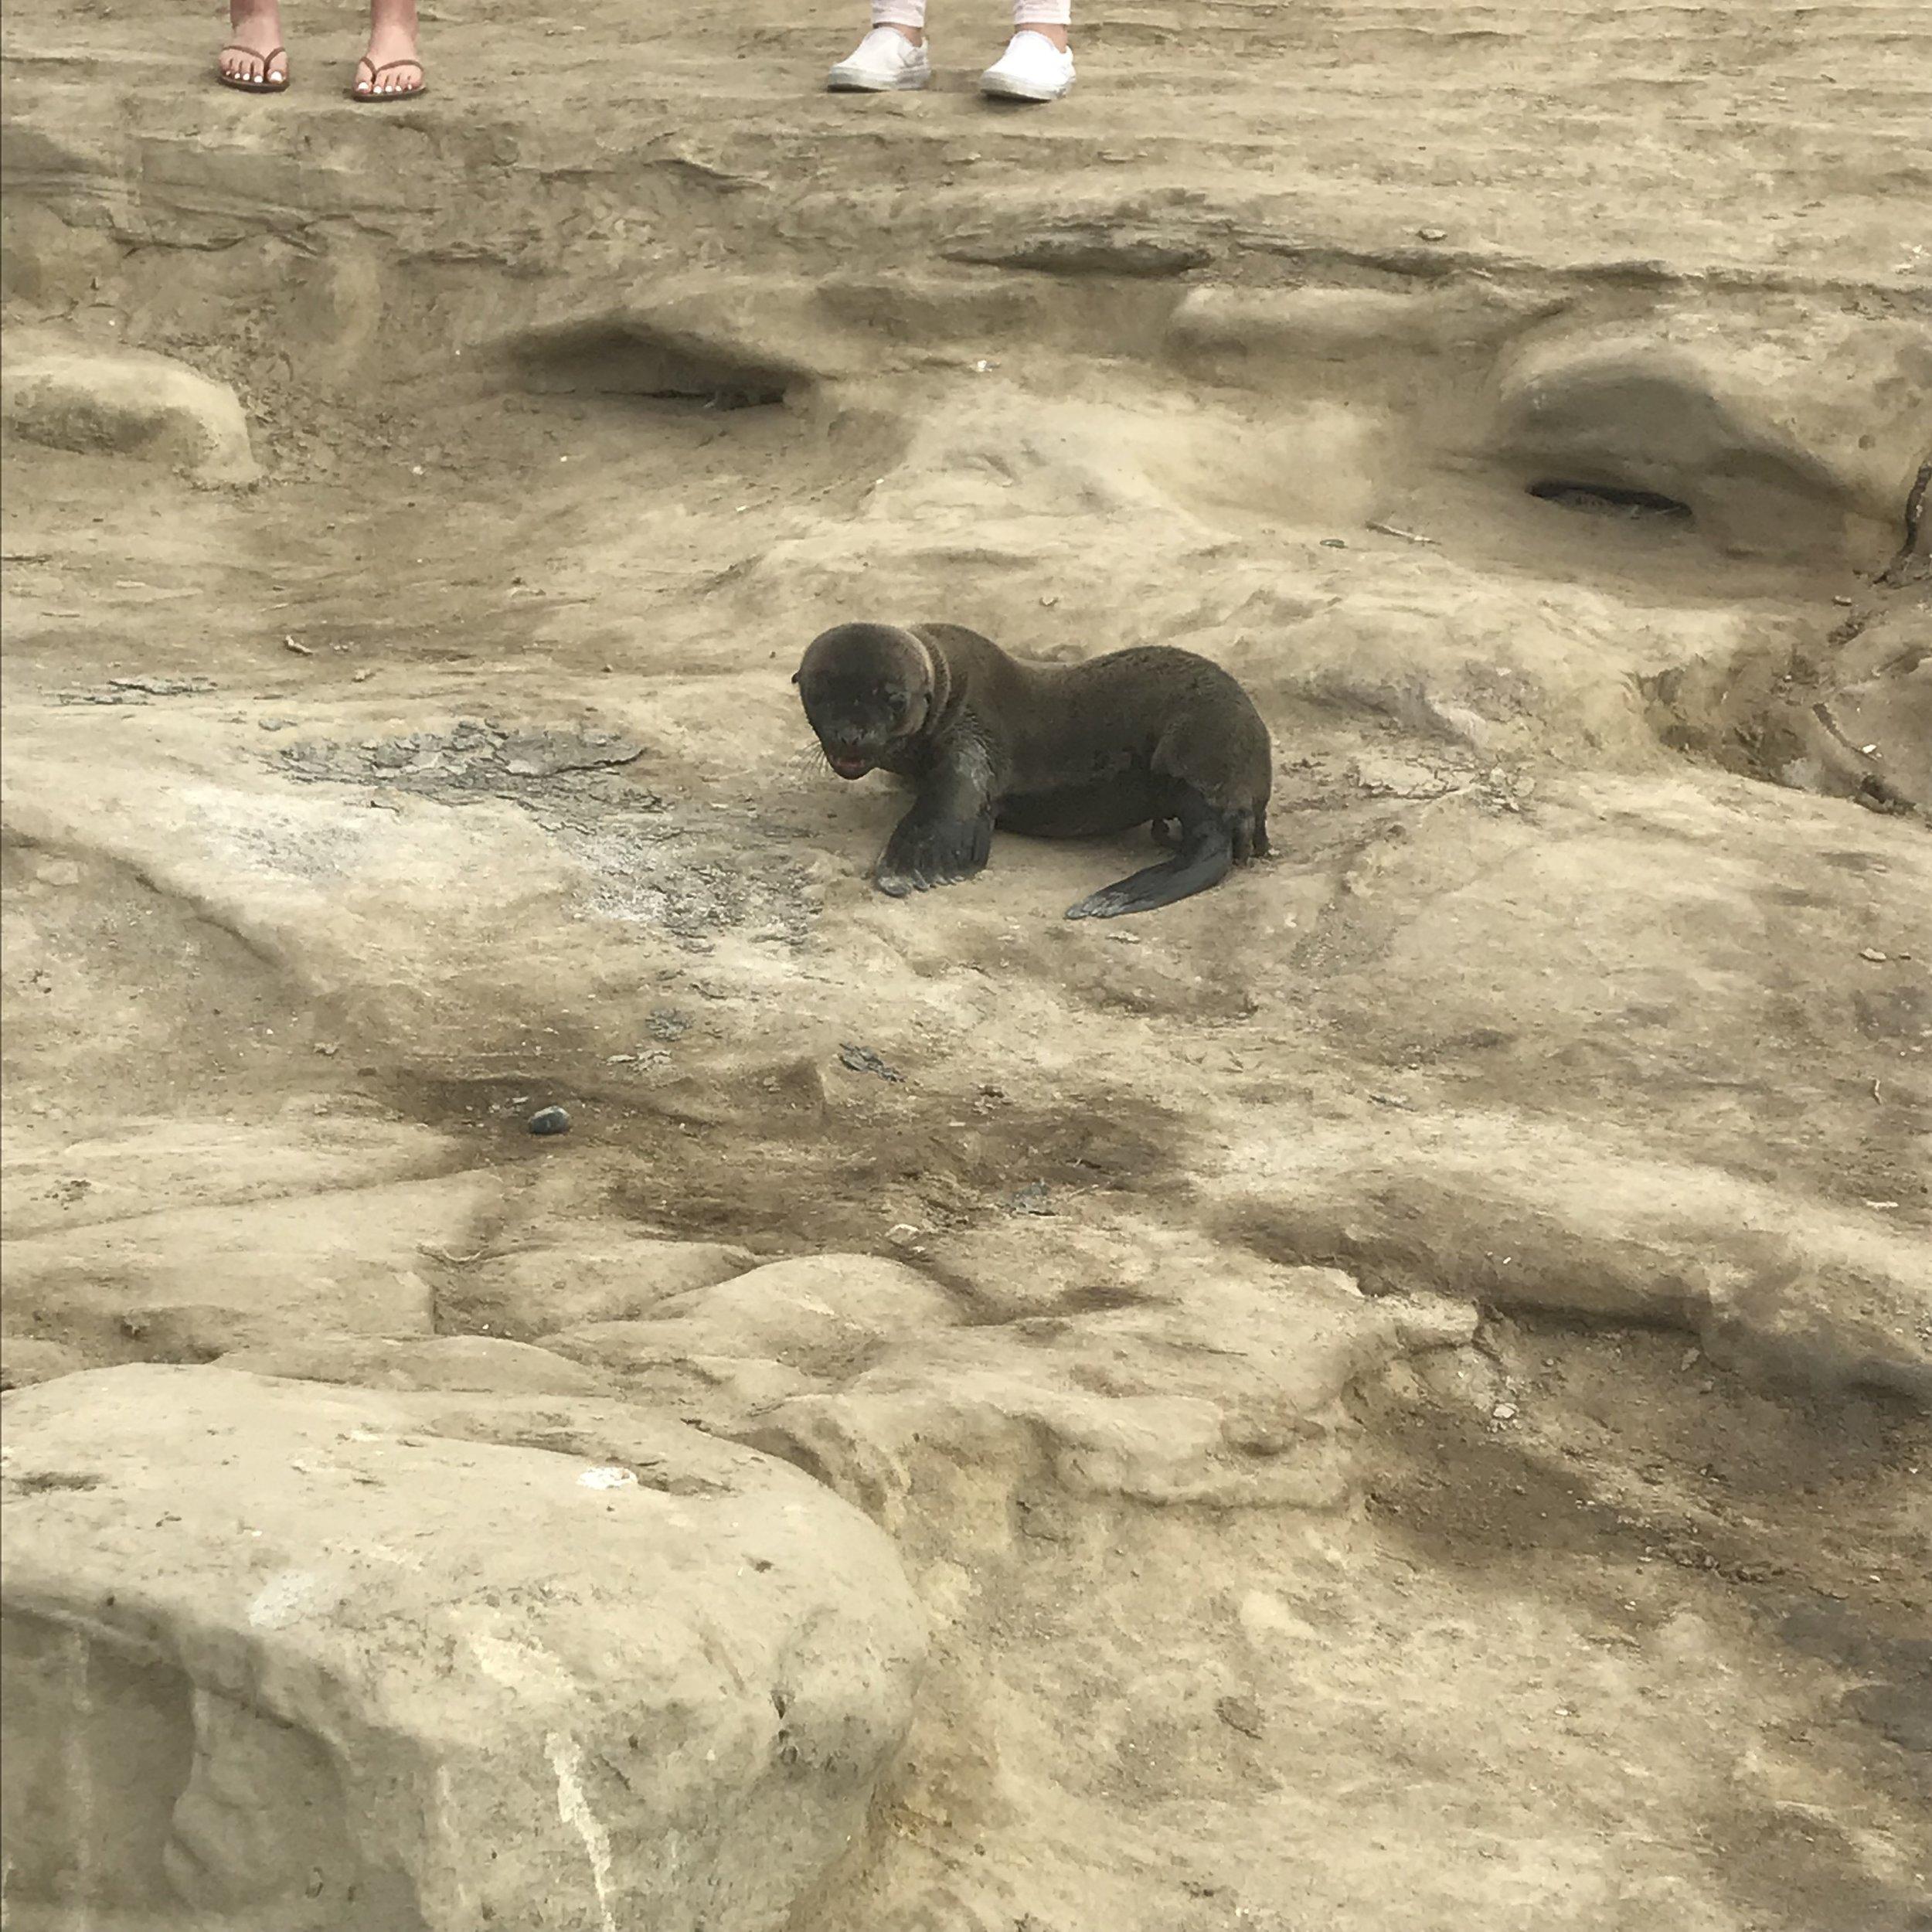 Baby seal climbing rocks in San Diego!